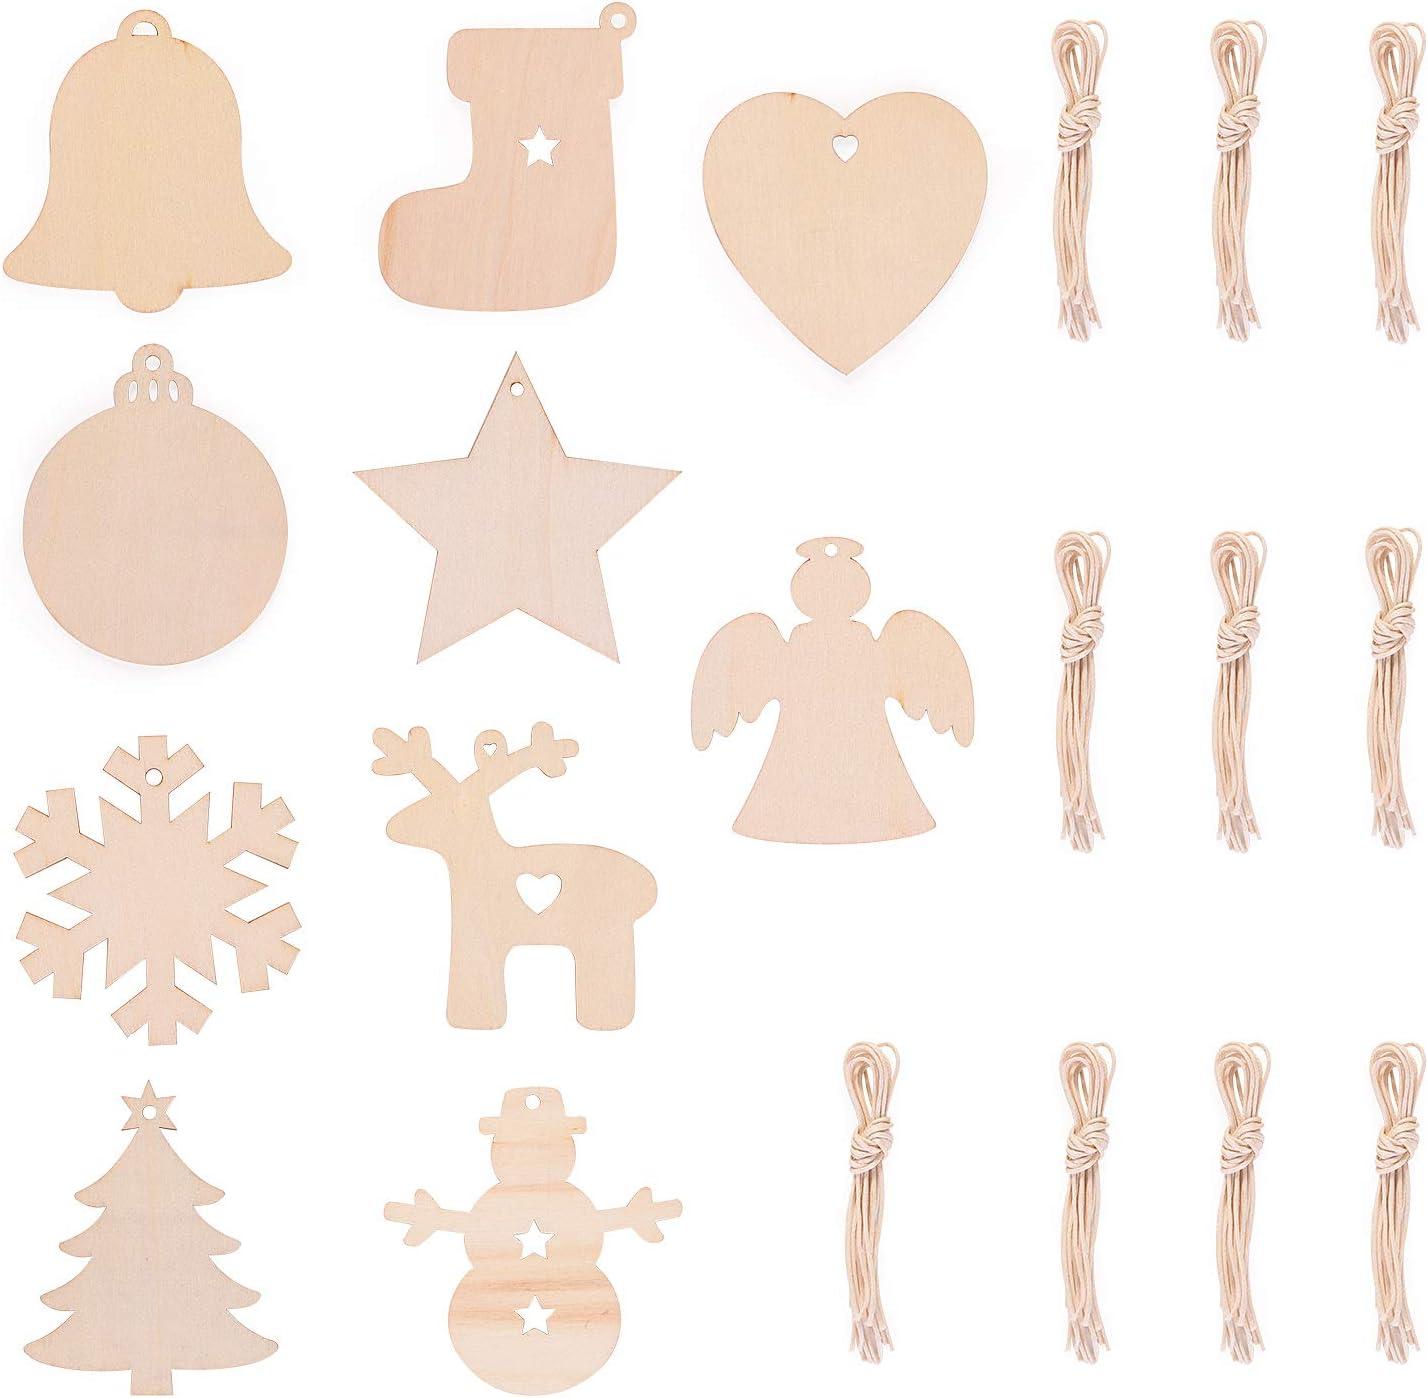 100 pcs EKKONG 100 Pezzi Decorazioni Albero di Natale in Legno,Decorazioni Albero di Natale,Ciondolo Albero di Natale,Ornamenti di Natale Decorazioni